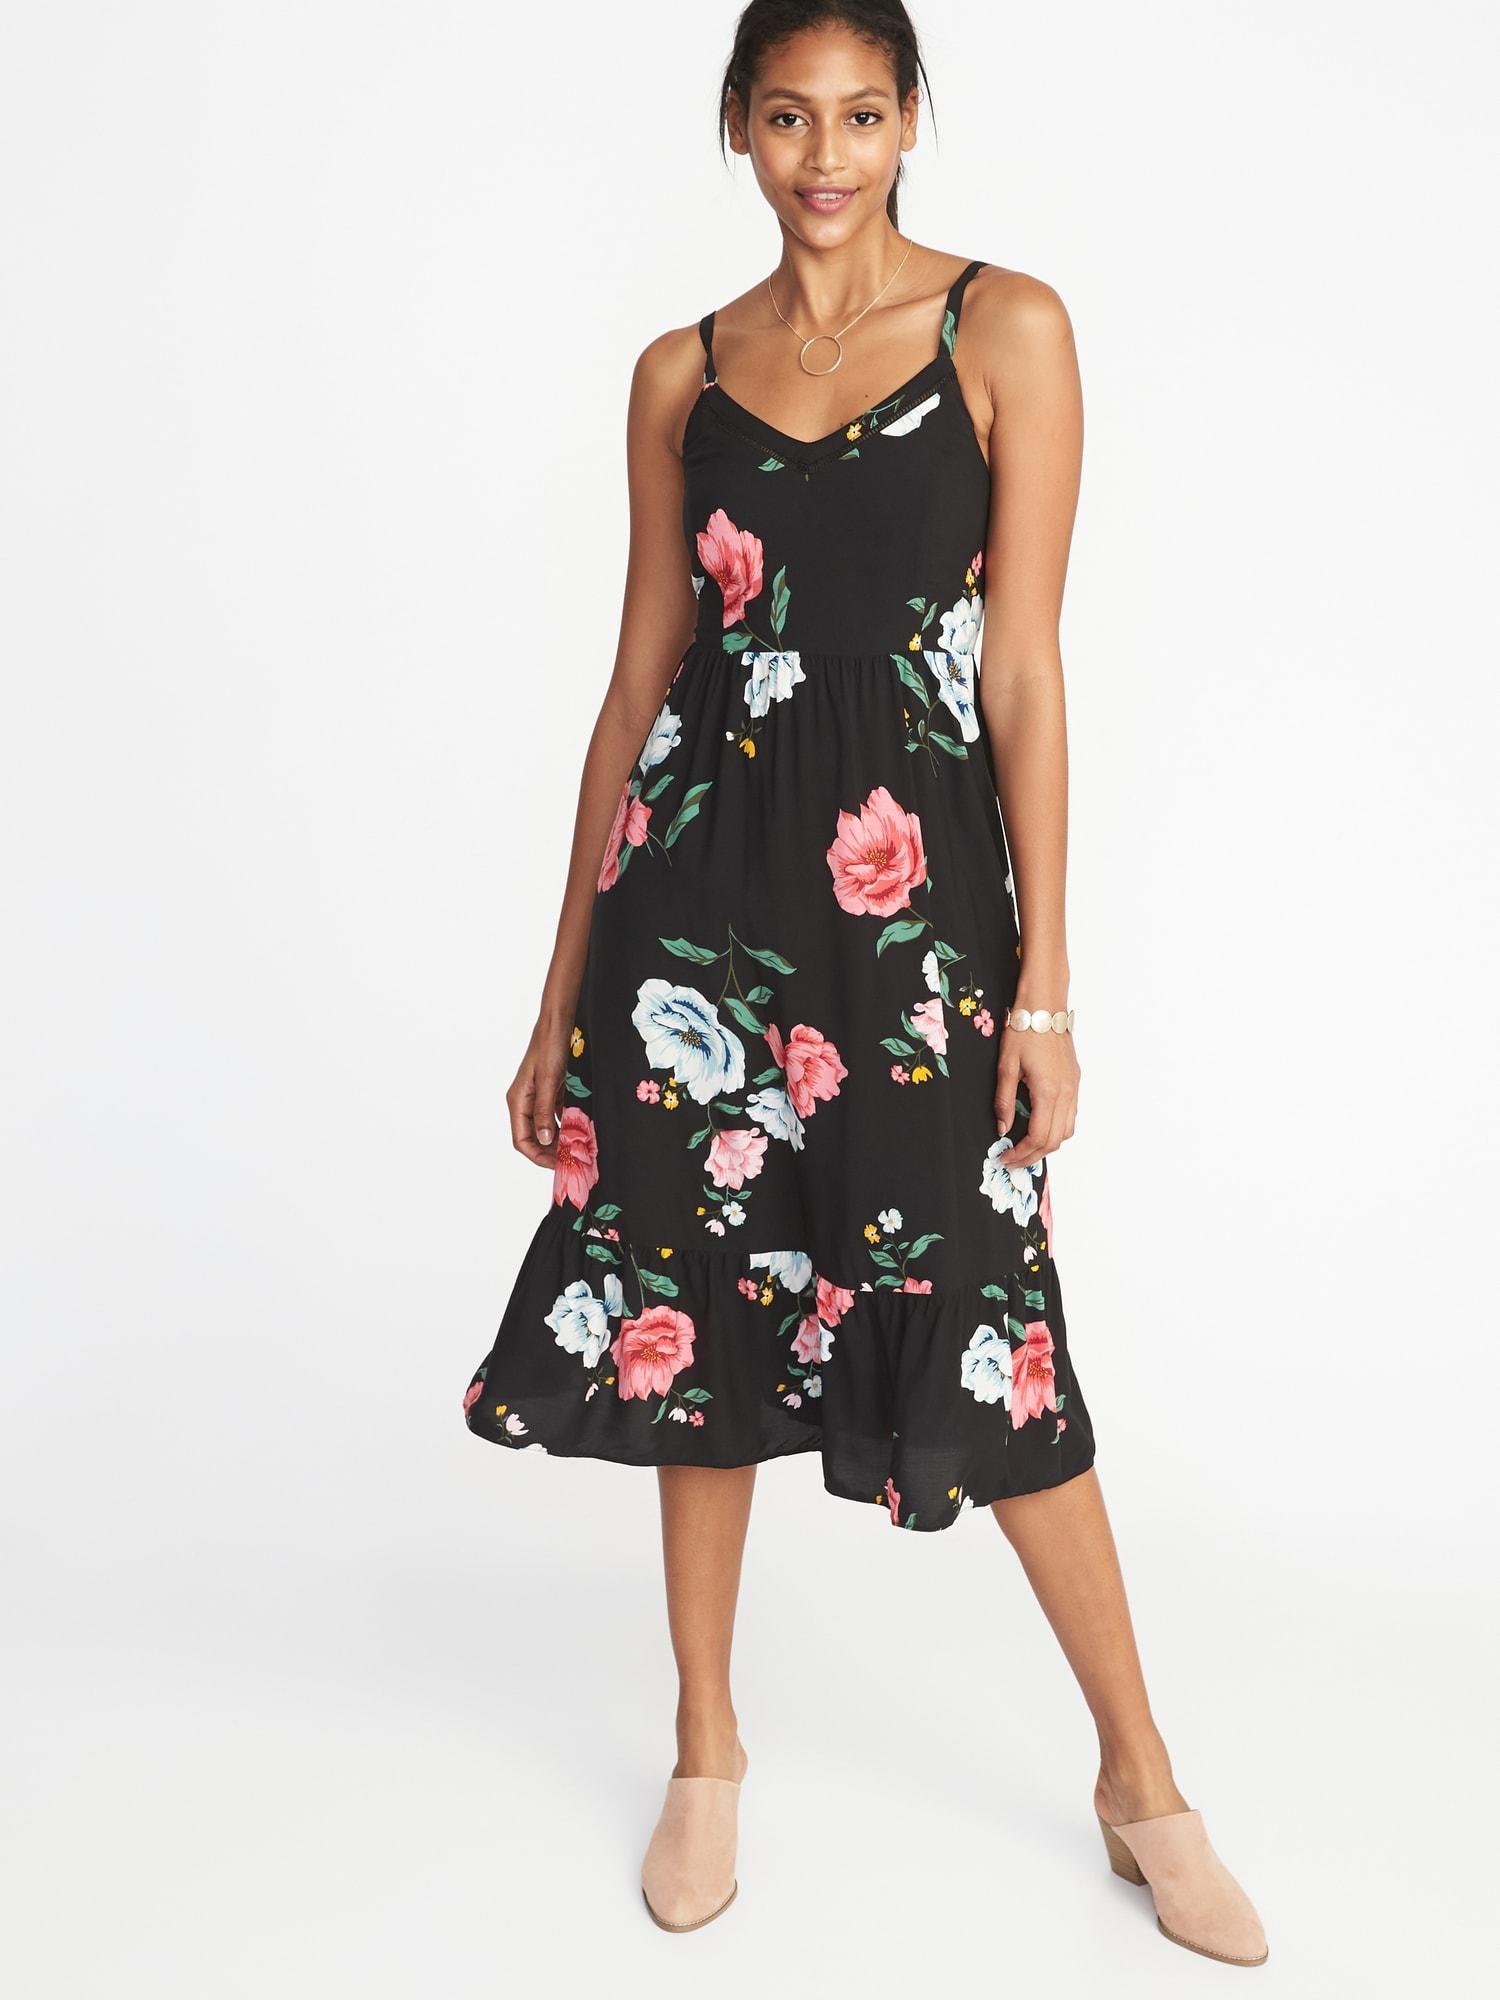 936595f39e1 Lyst - Old Navy Fit   Flare Cami Midi Dress in Black